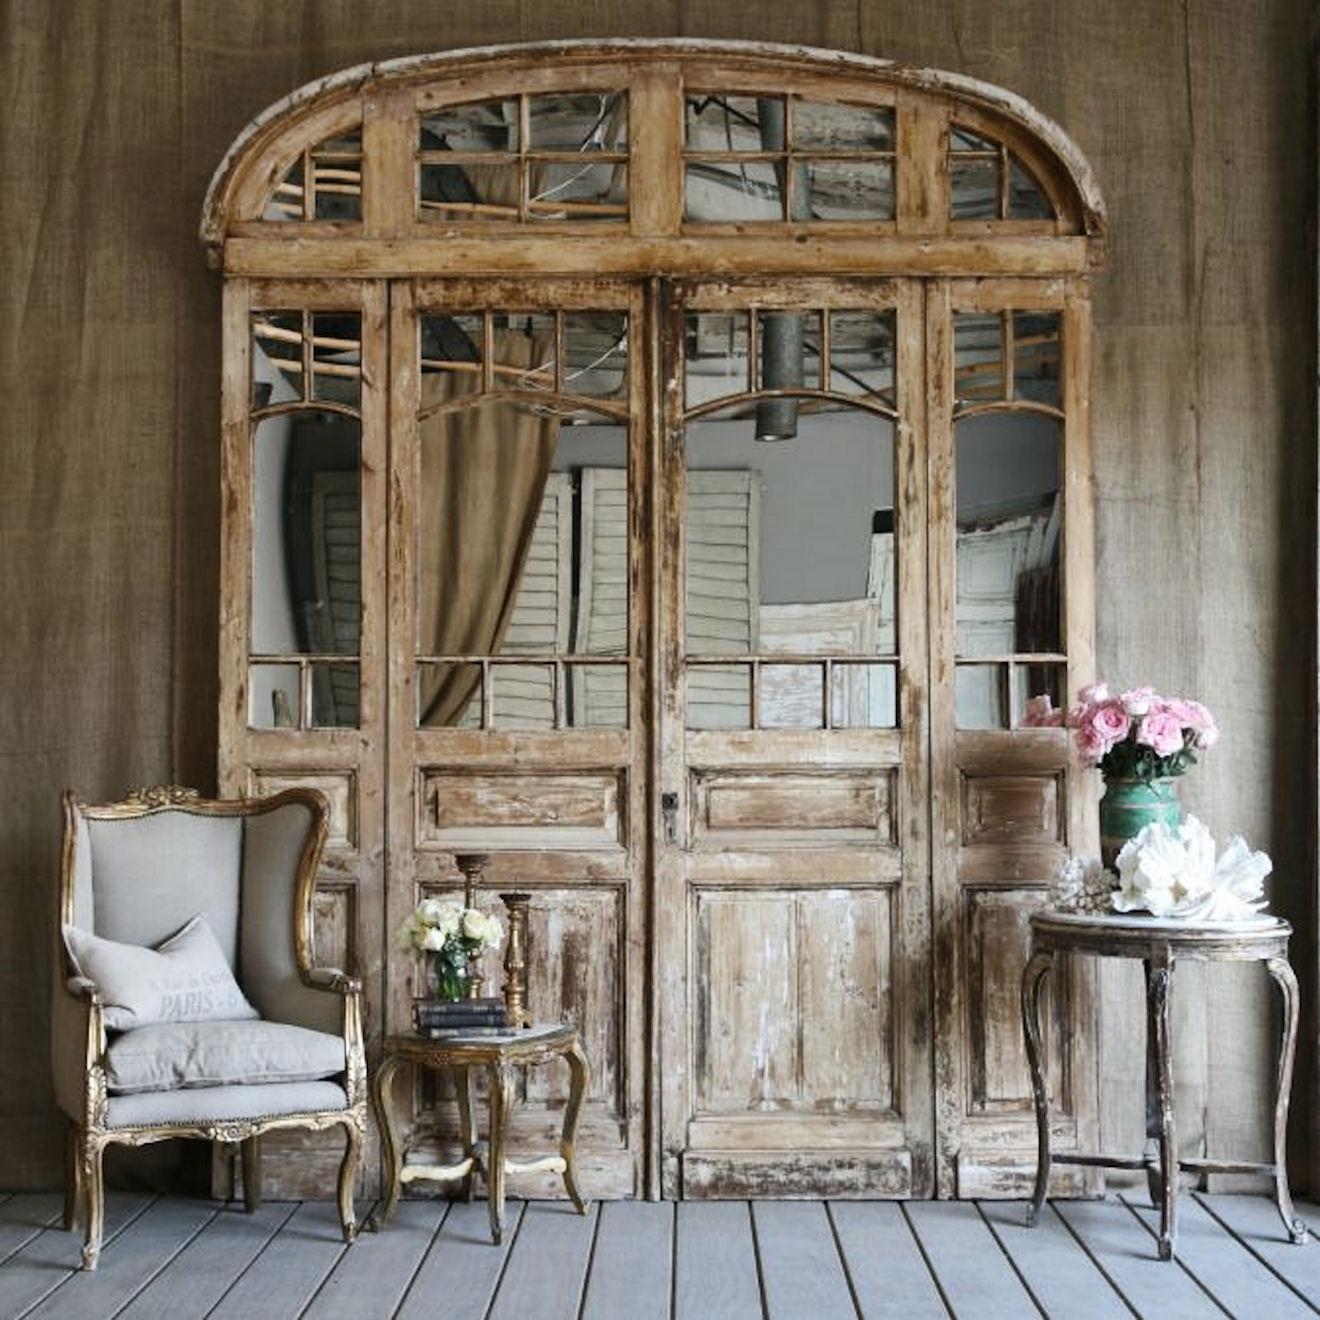 Antique interior french doors interiors design french doors with vintage flair doors interior this old house antique rubansaba